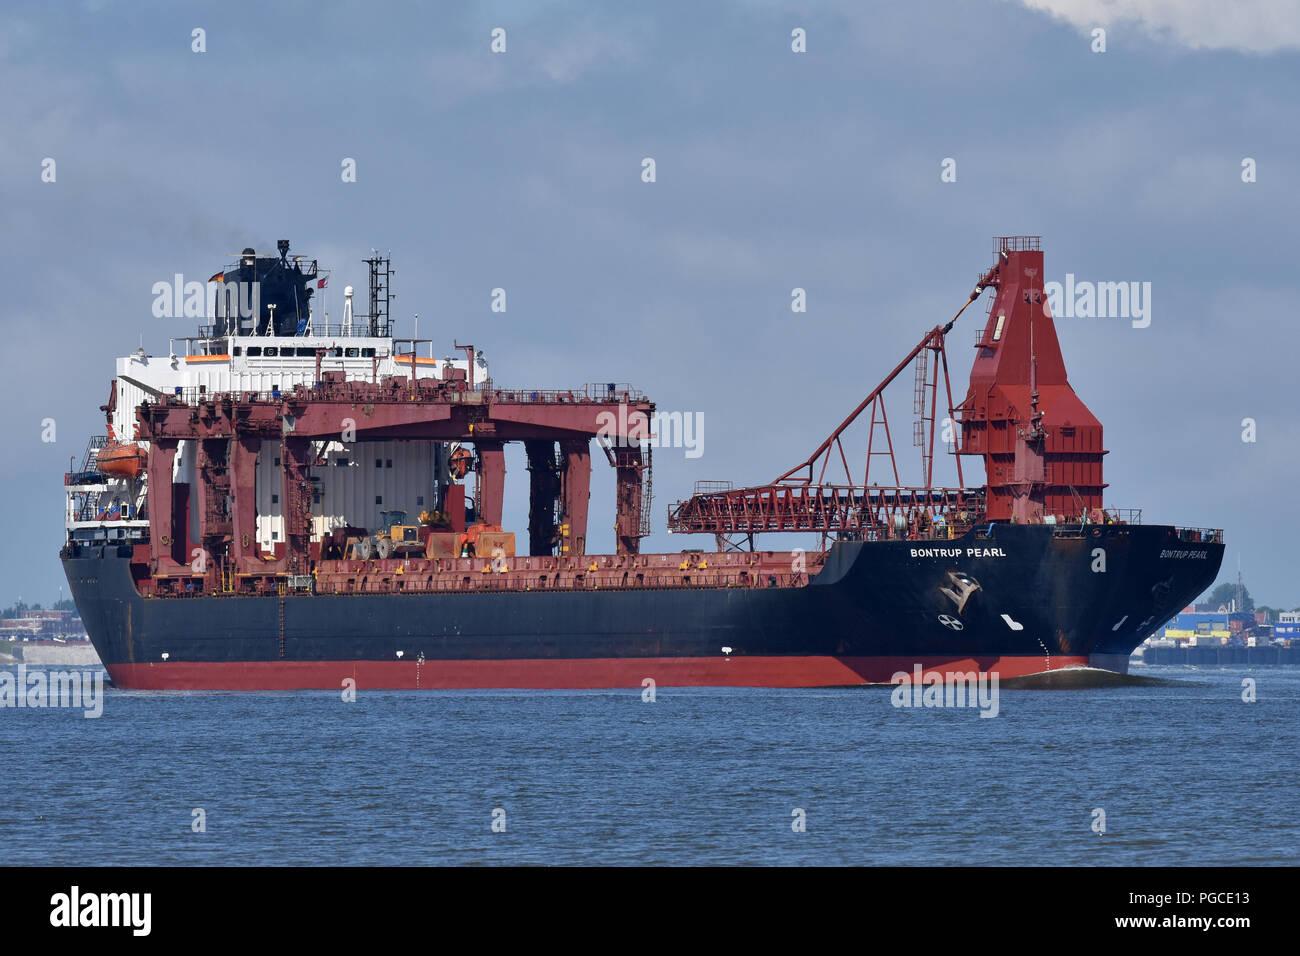 Self-Discharging Bulk-Carrier Bontrup Pearl Stock Photo